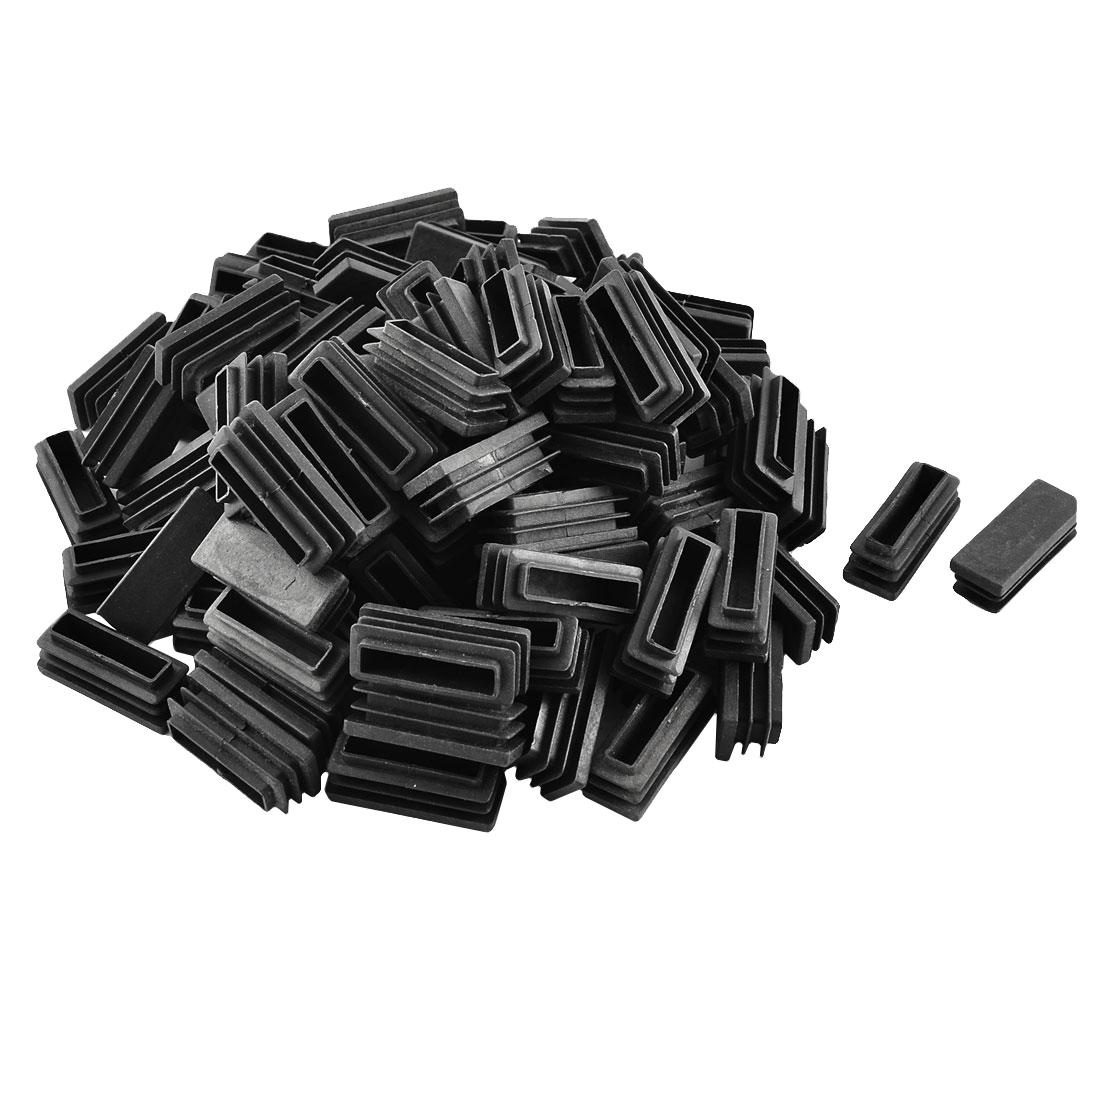 Plastic Rectangle Tube Pipe Inserts End Blanking Cap Black 15mm x 40mm 100pcs